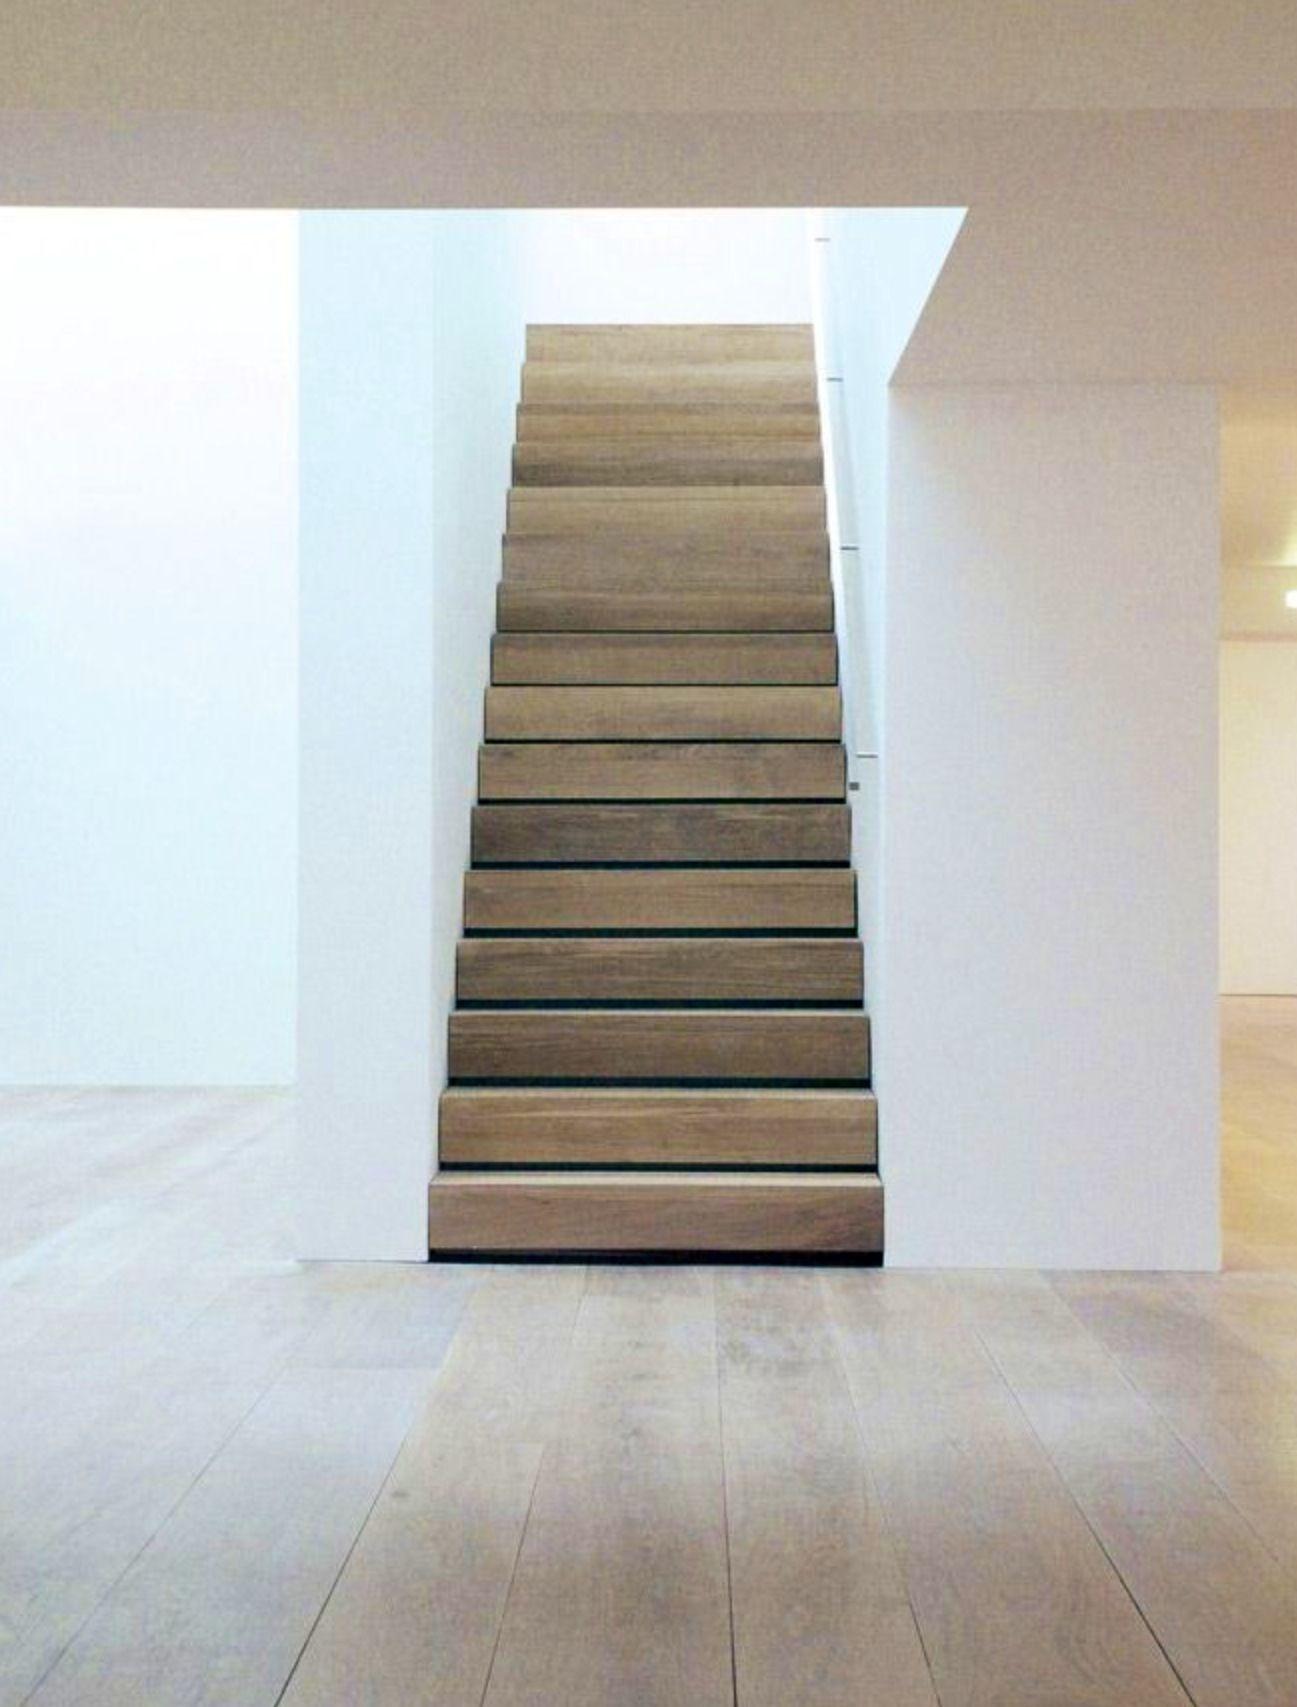 Pin De Glenn Gissler Design En Stairs Pinterest Escalera Y  # Muebles Excell Aguascalientes